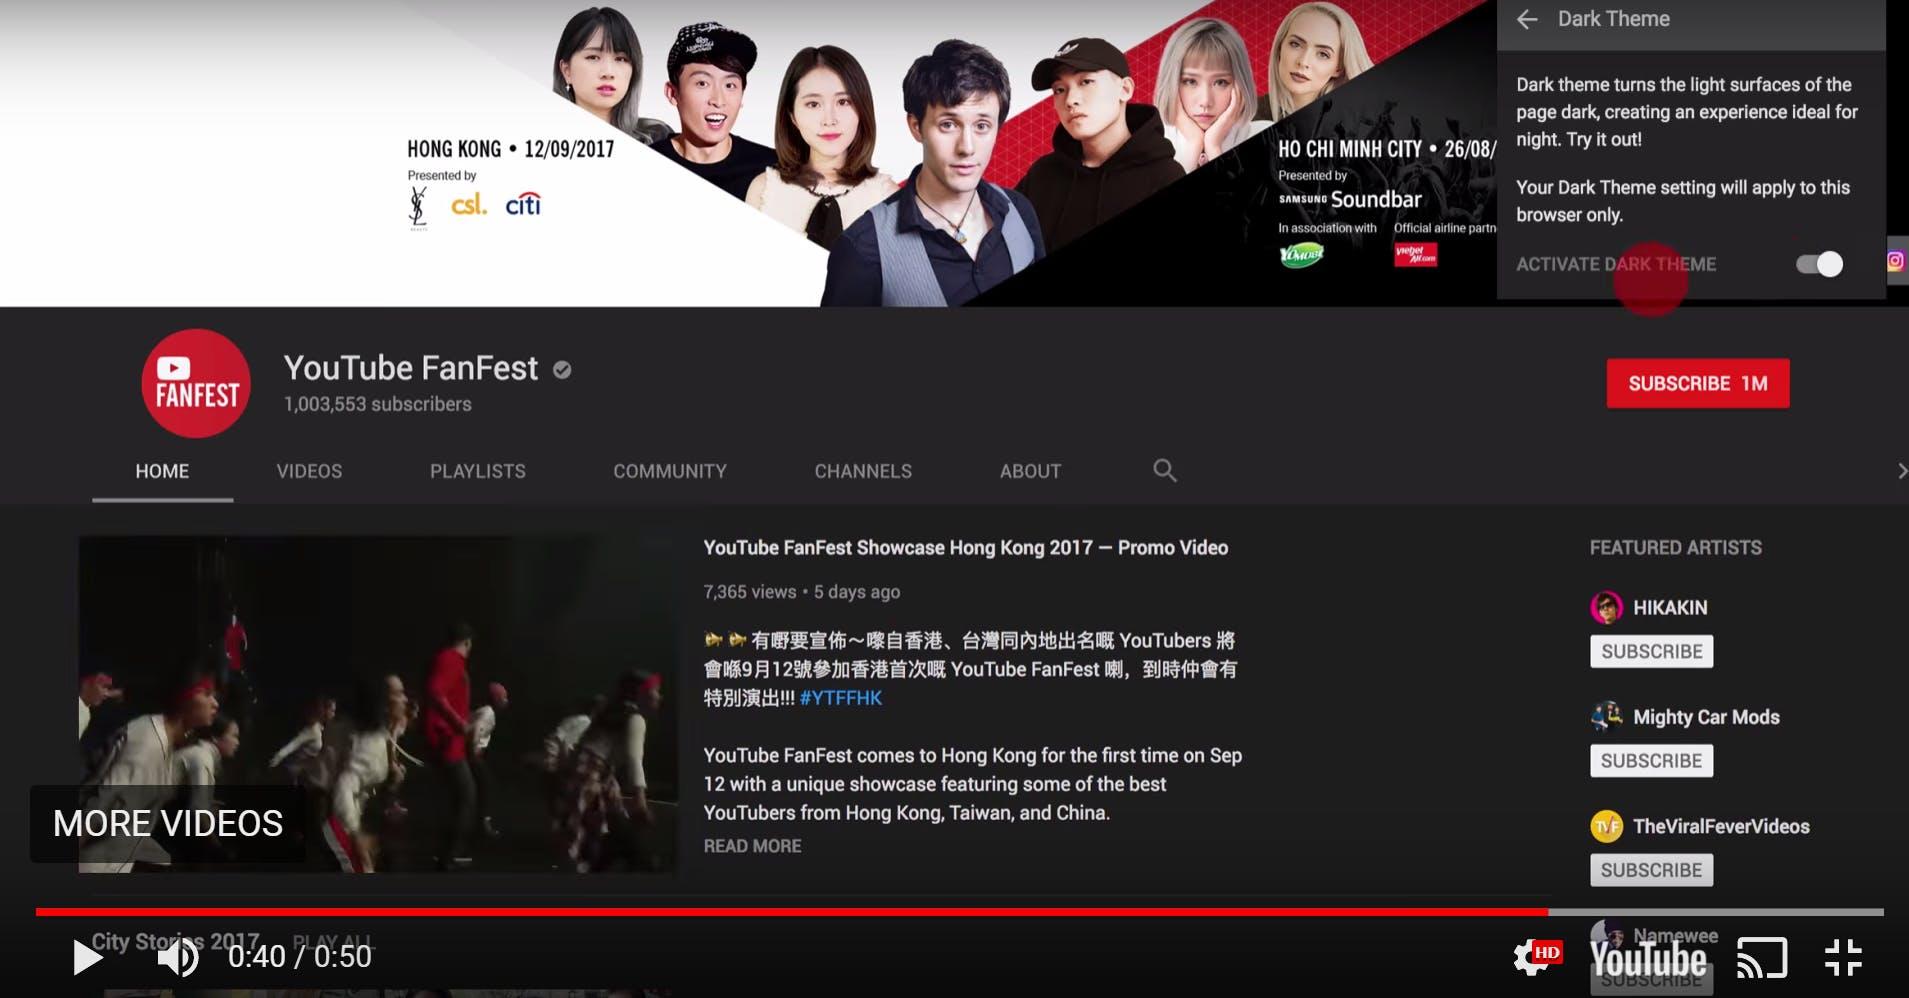 youtube redesign dark mode desktop